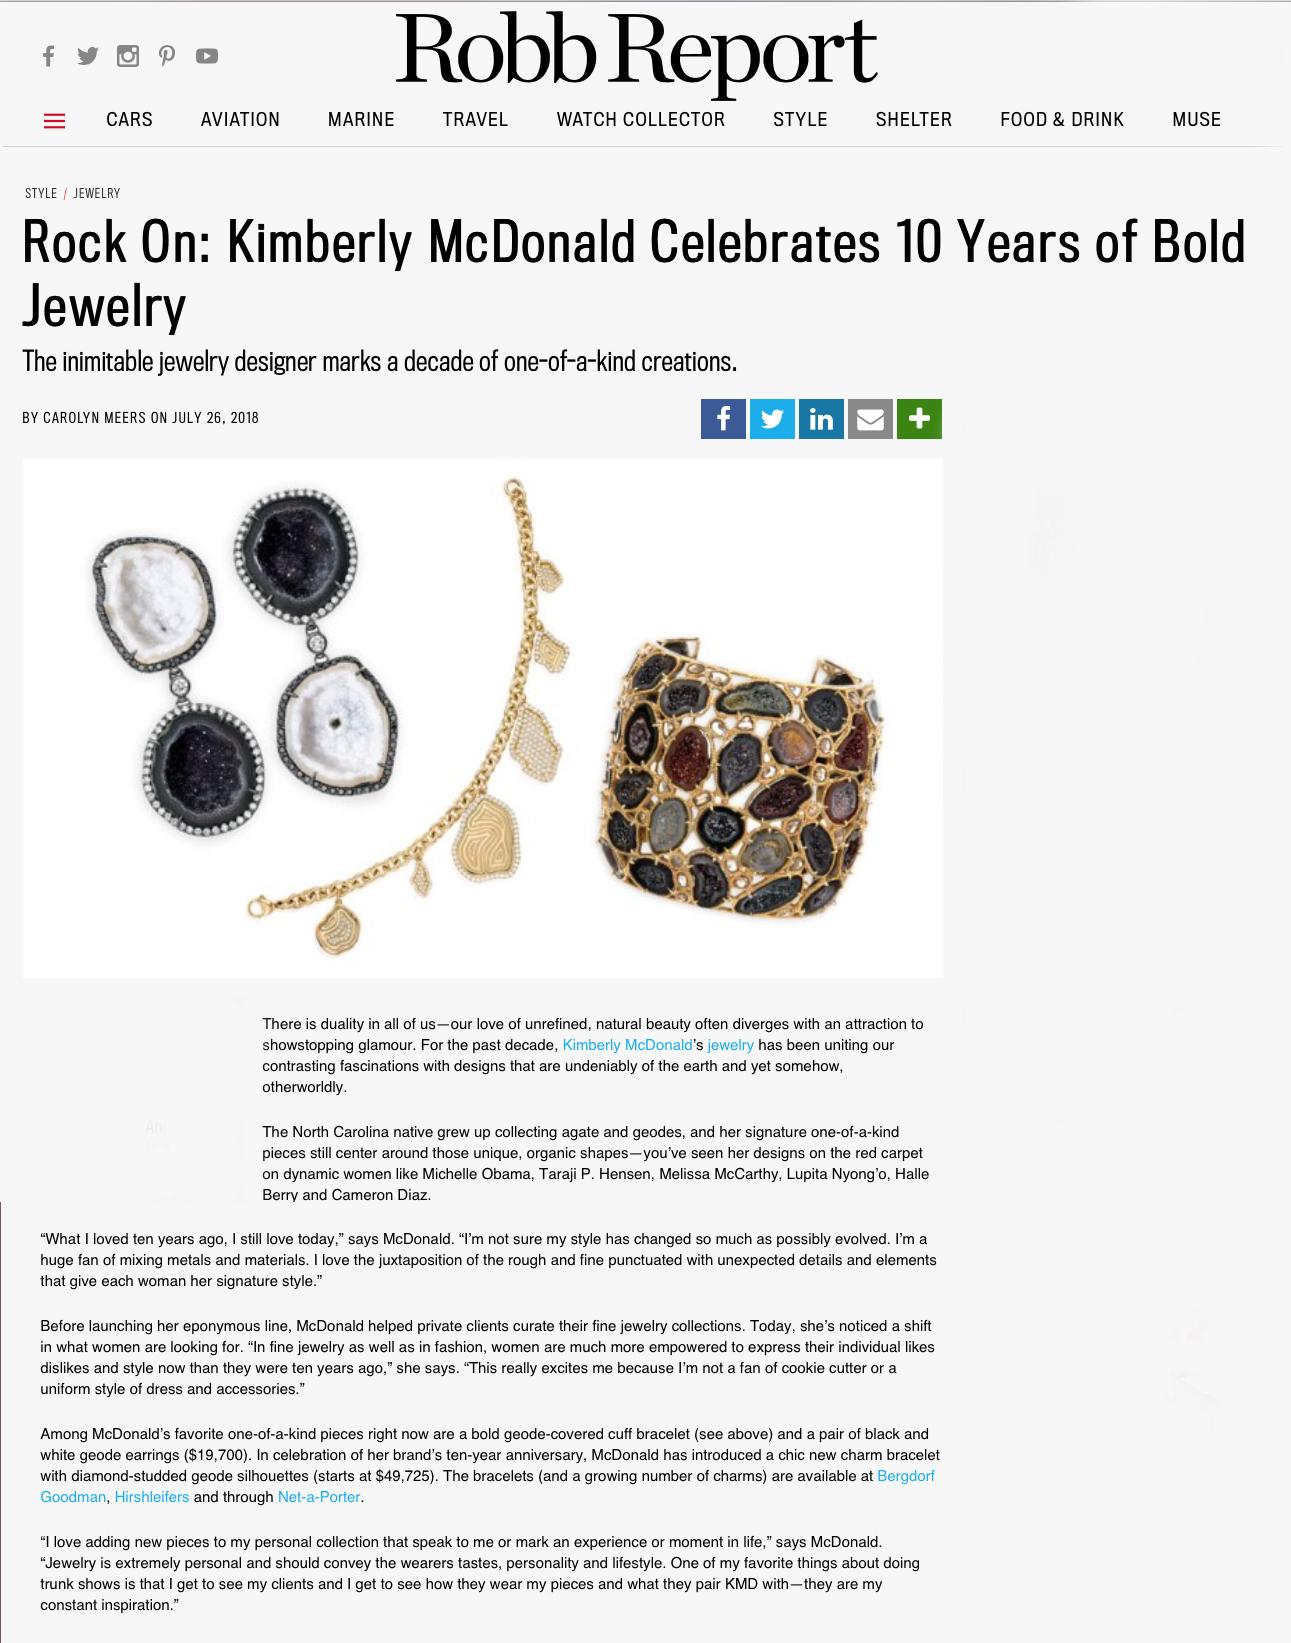 PRESS — Kimberly McDonald